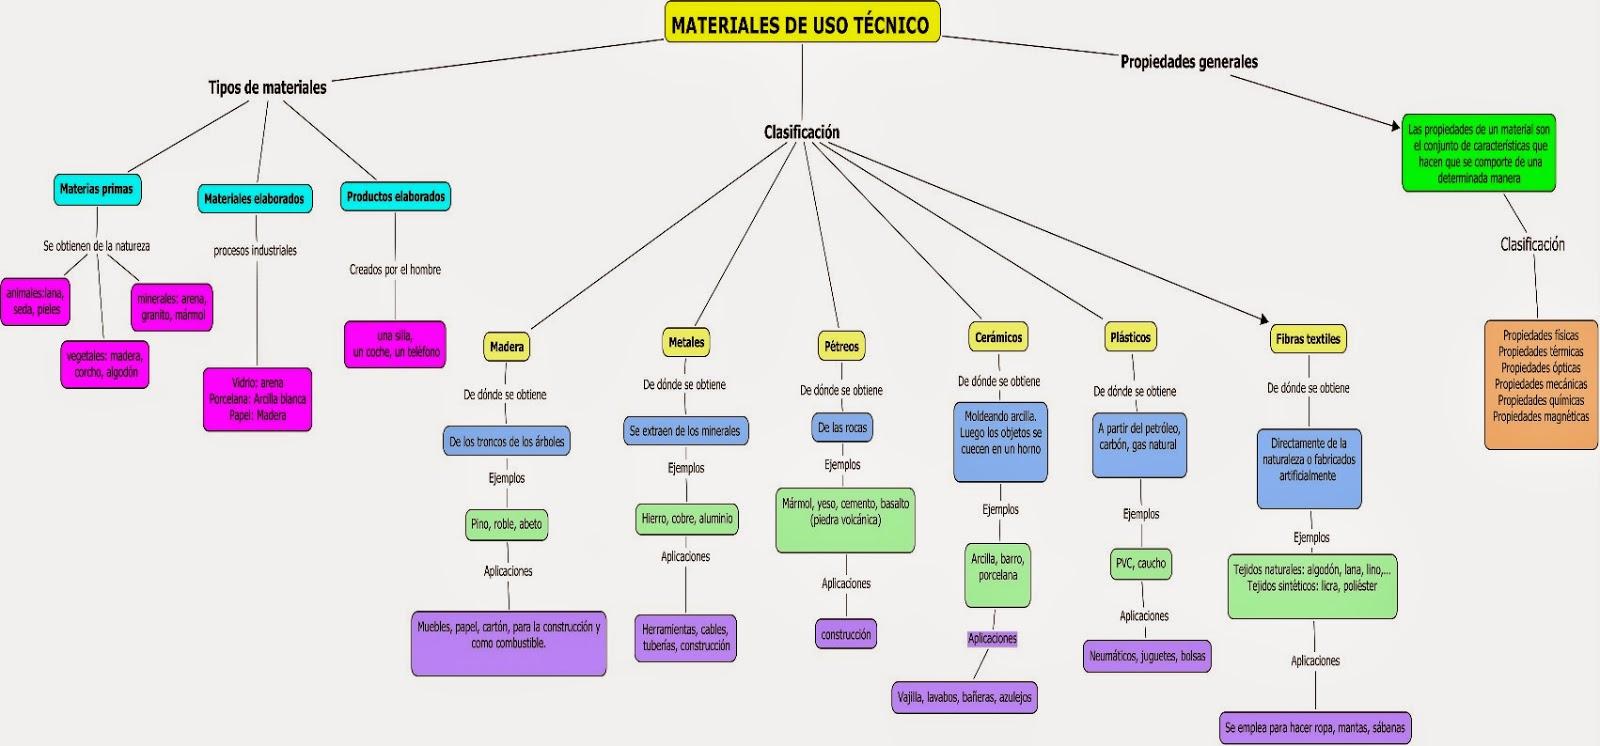 MATERIALES DE USO TECNICO: MAPA CONCEPTUAL